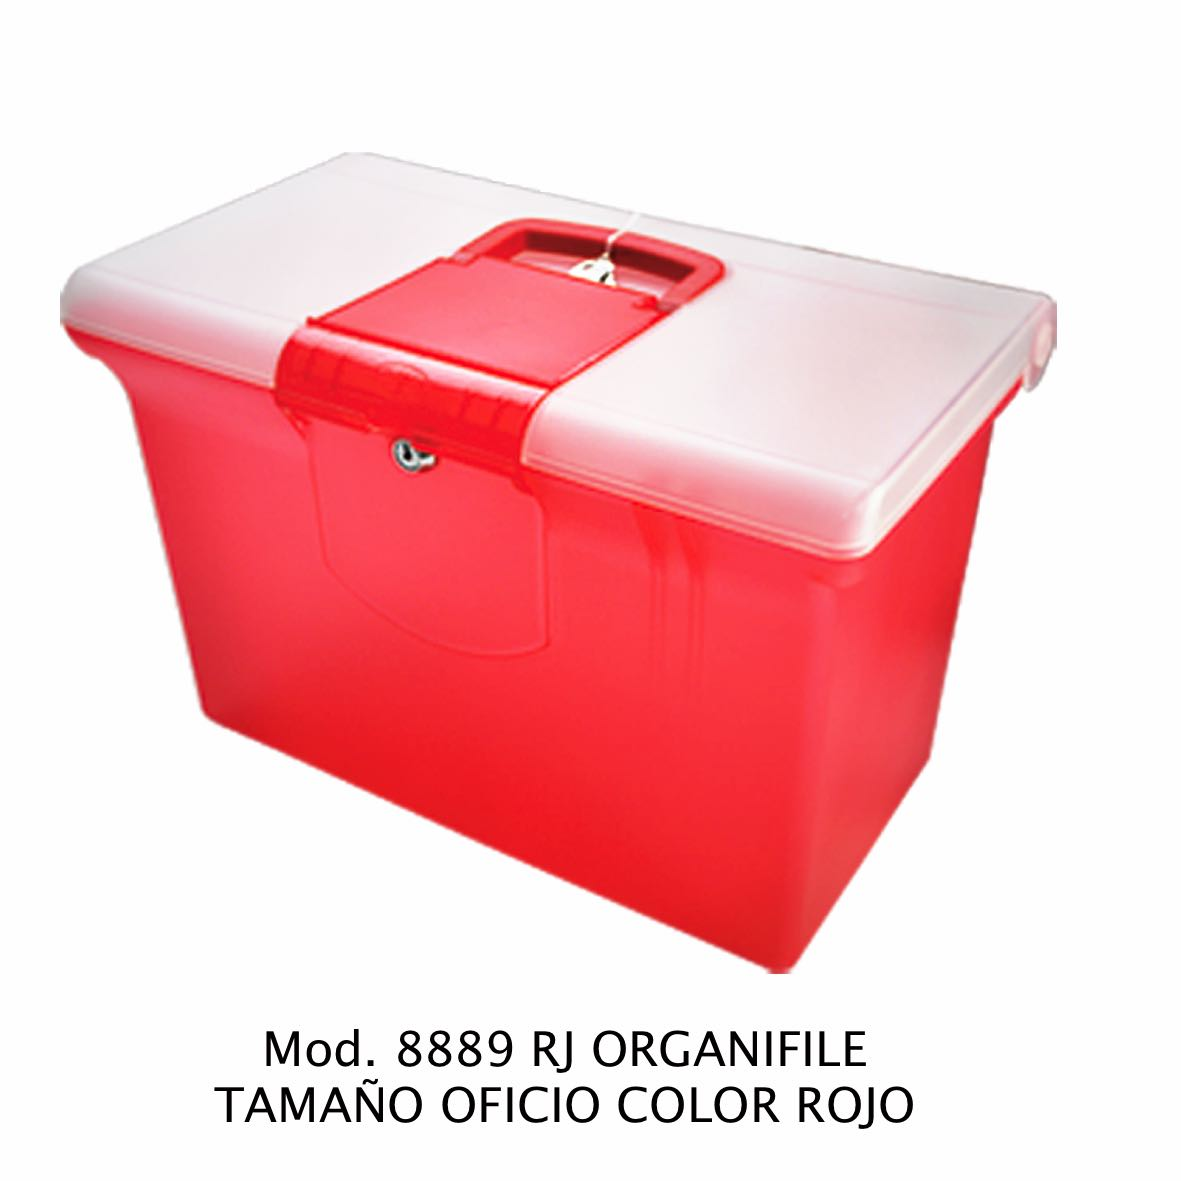 Organifile tamaño oficio de color rojo Modelo 8889 RJ - Sablón